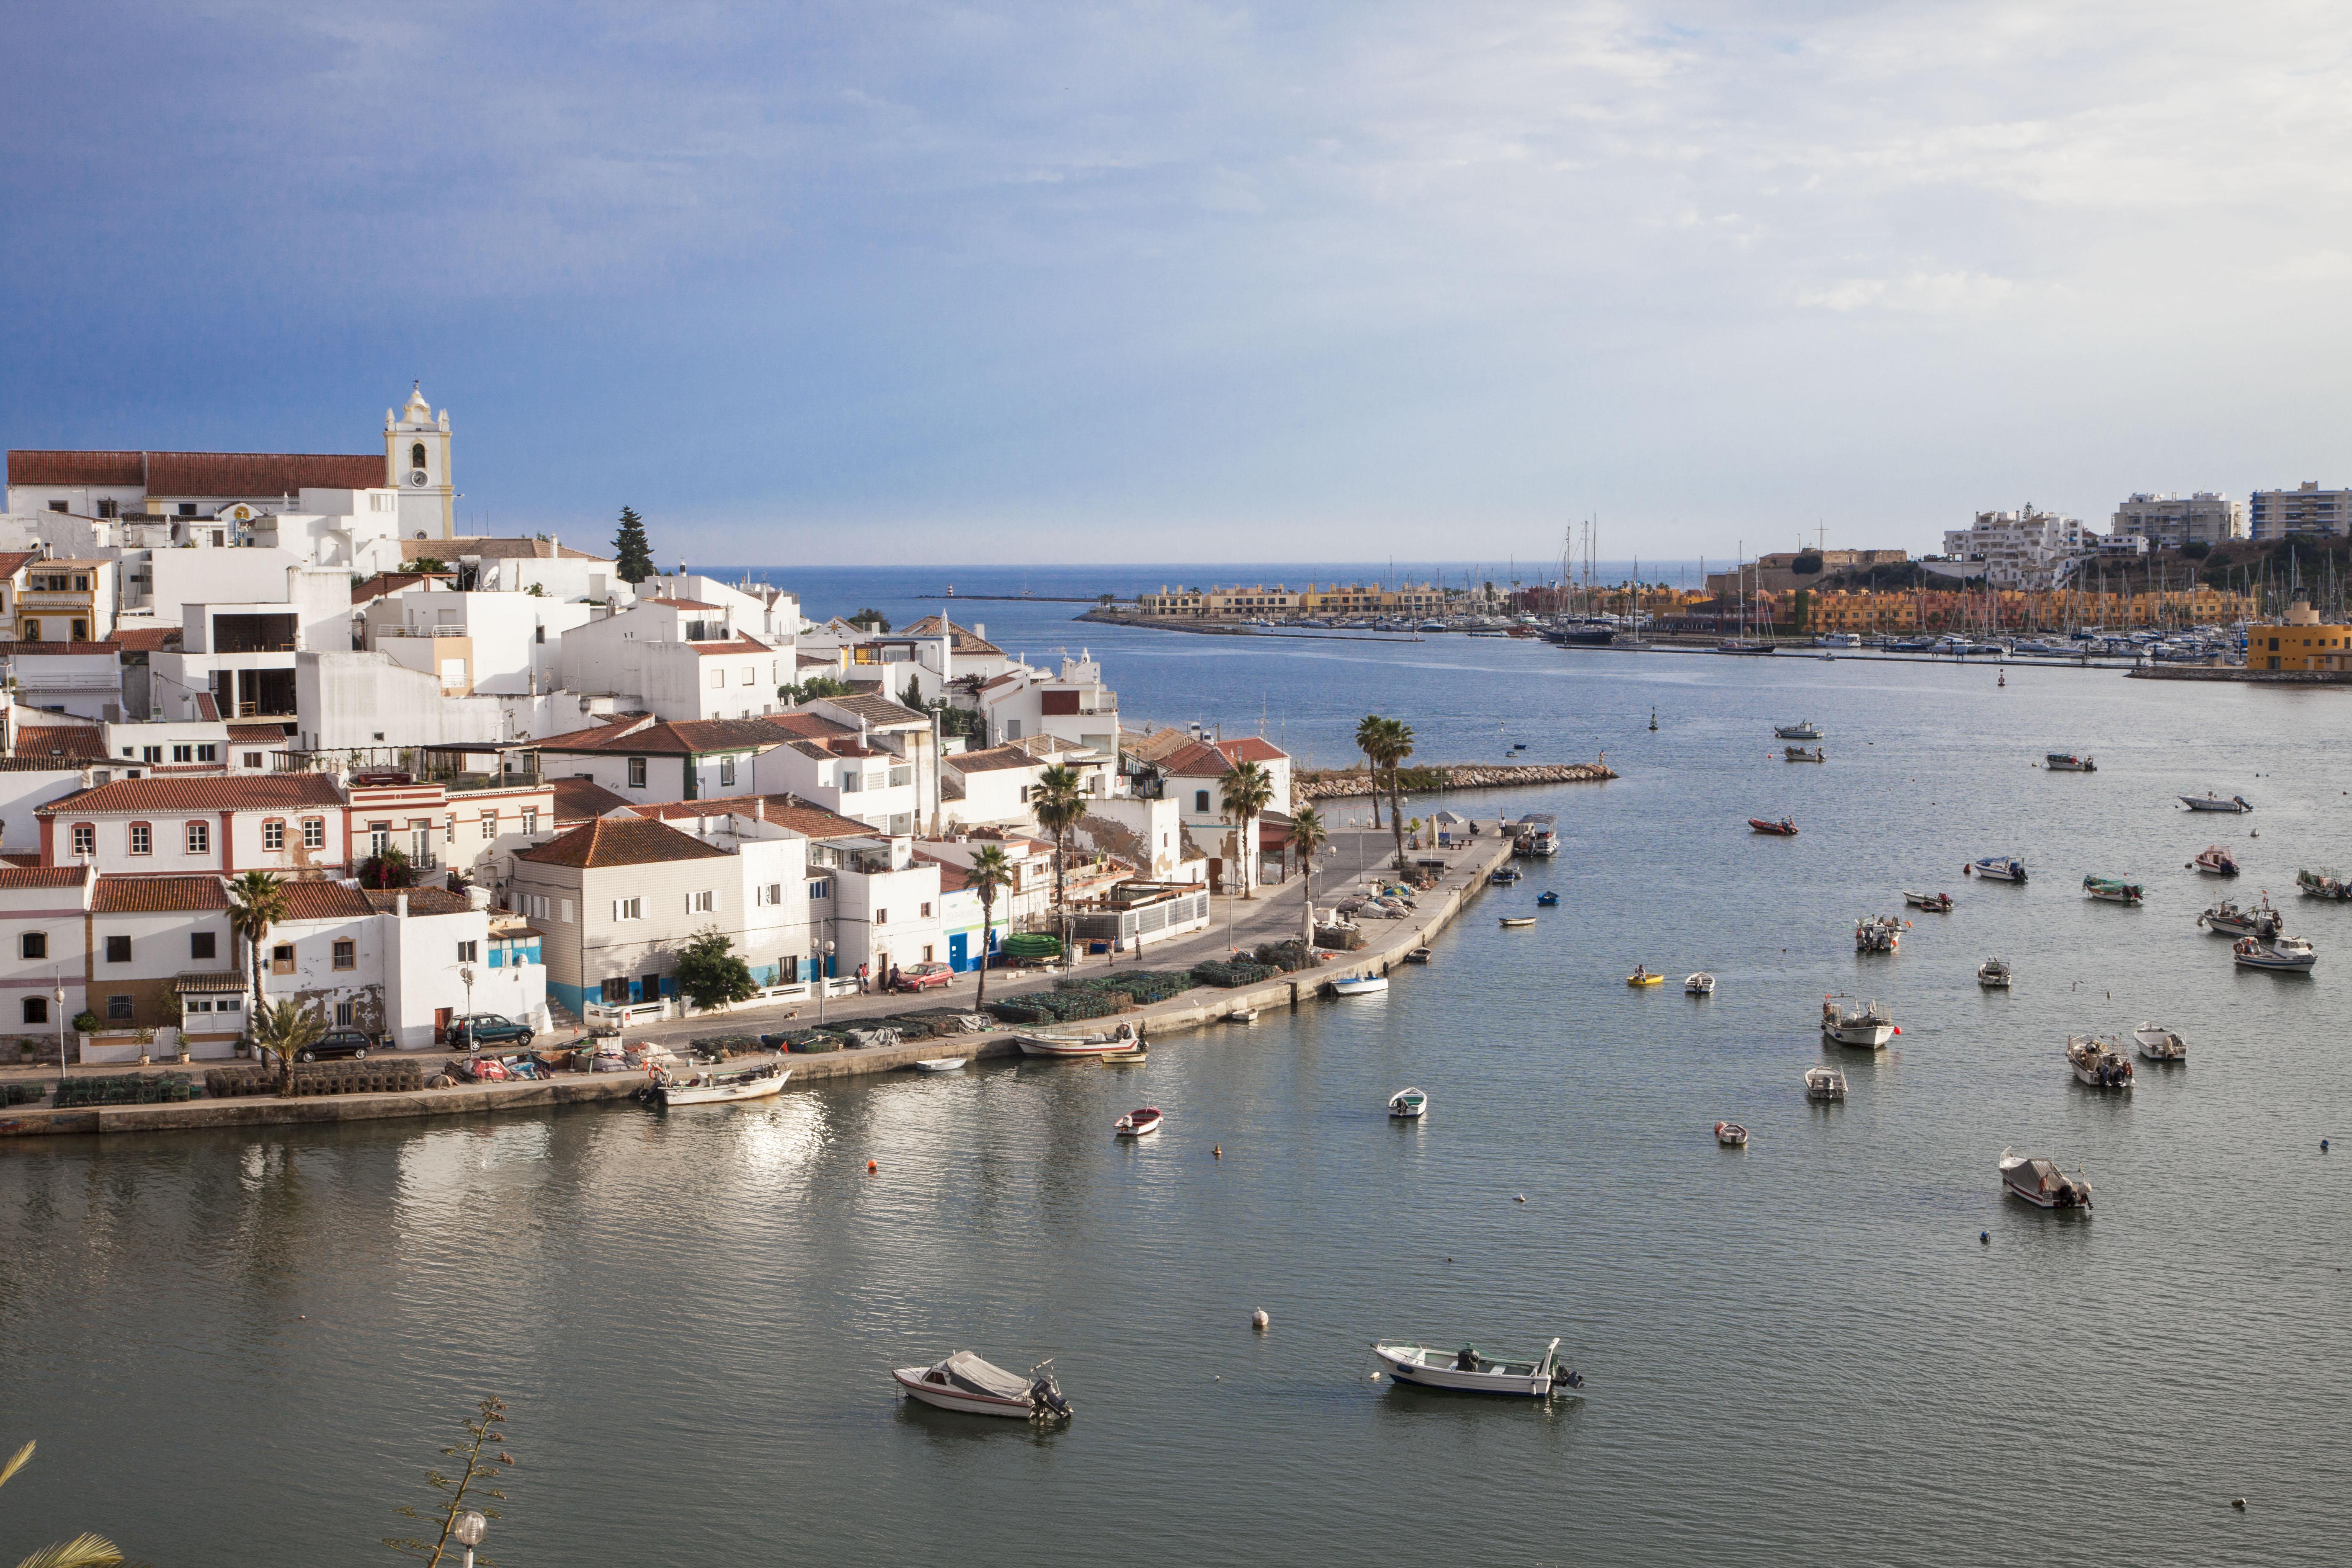 PORTUGALIA - LATO 2019: Vitor's Village***, 8 dni (12-19.05.2019 r.), śniadania: 2059,00 PLN/os. dorosła